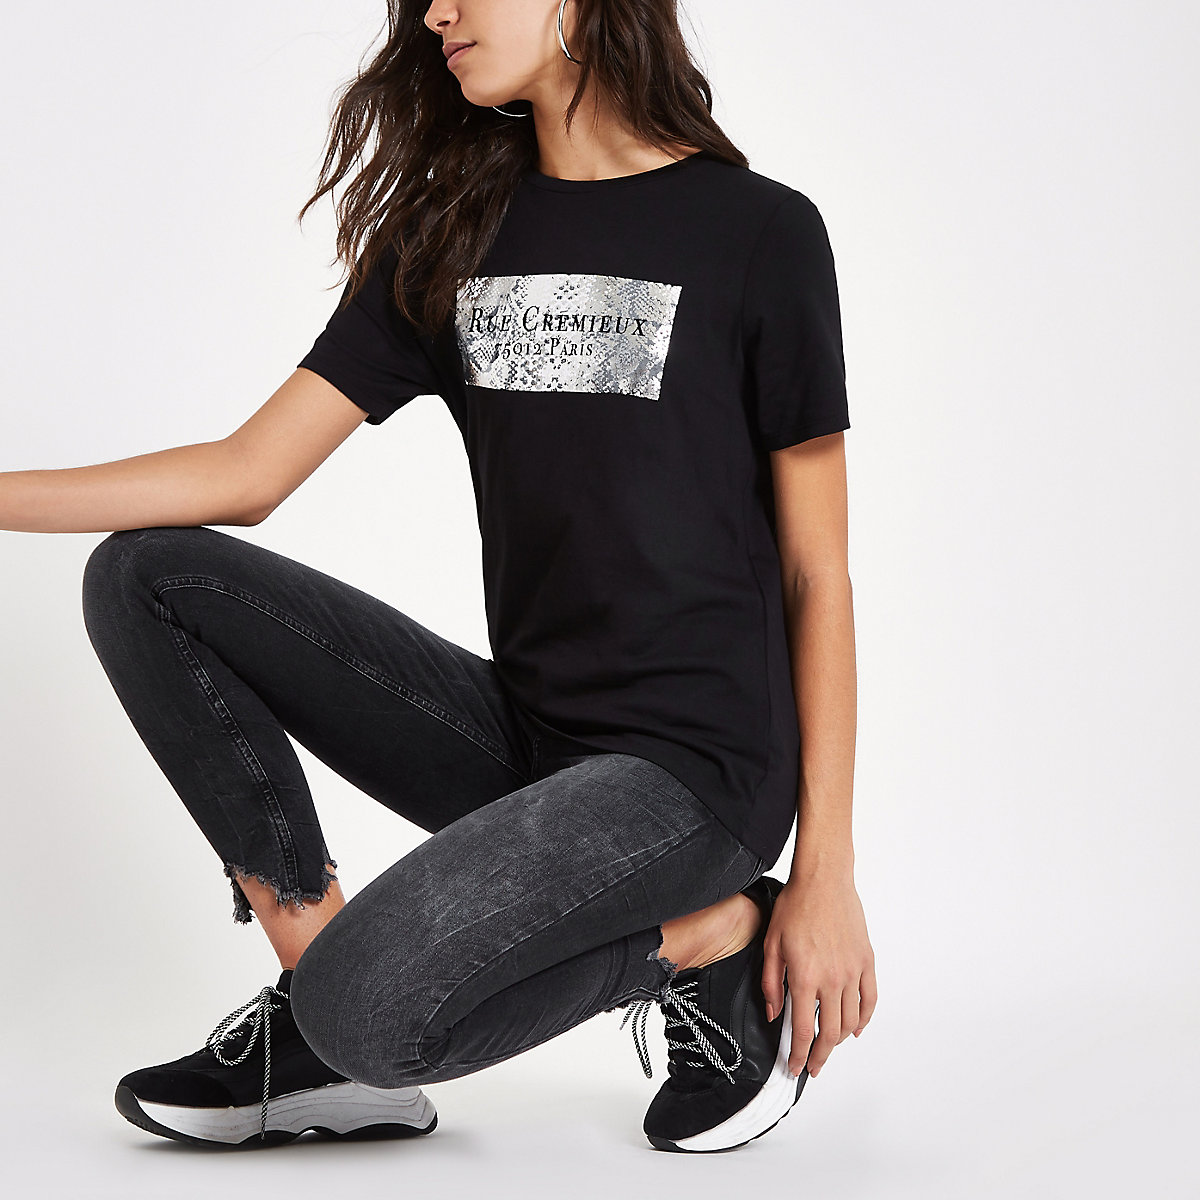 Black 'Rue Cremiux' print T-shirt